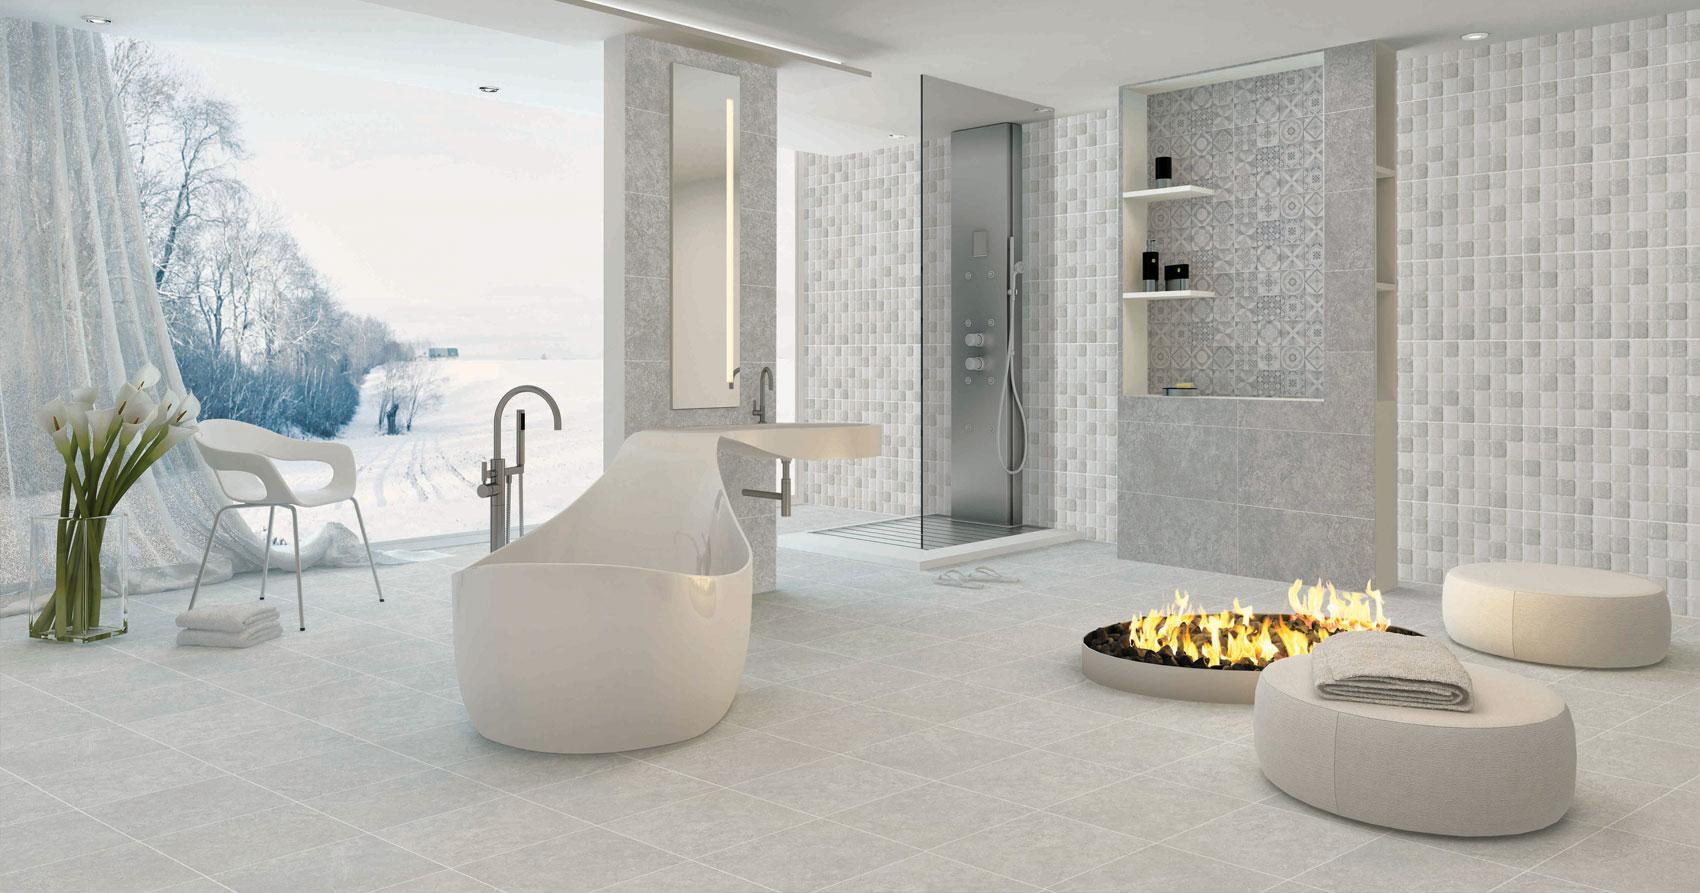 Quartet Modern Bathrooms Supplied And Installed Marbella